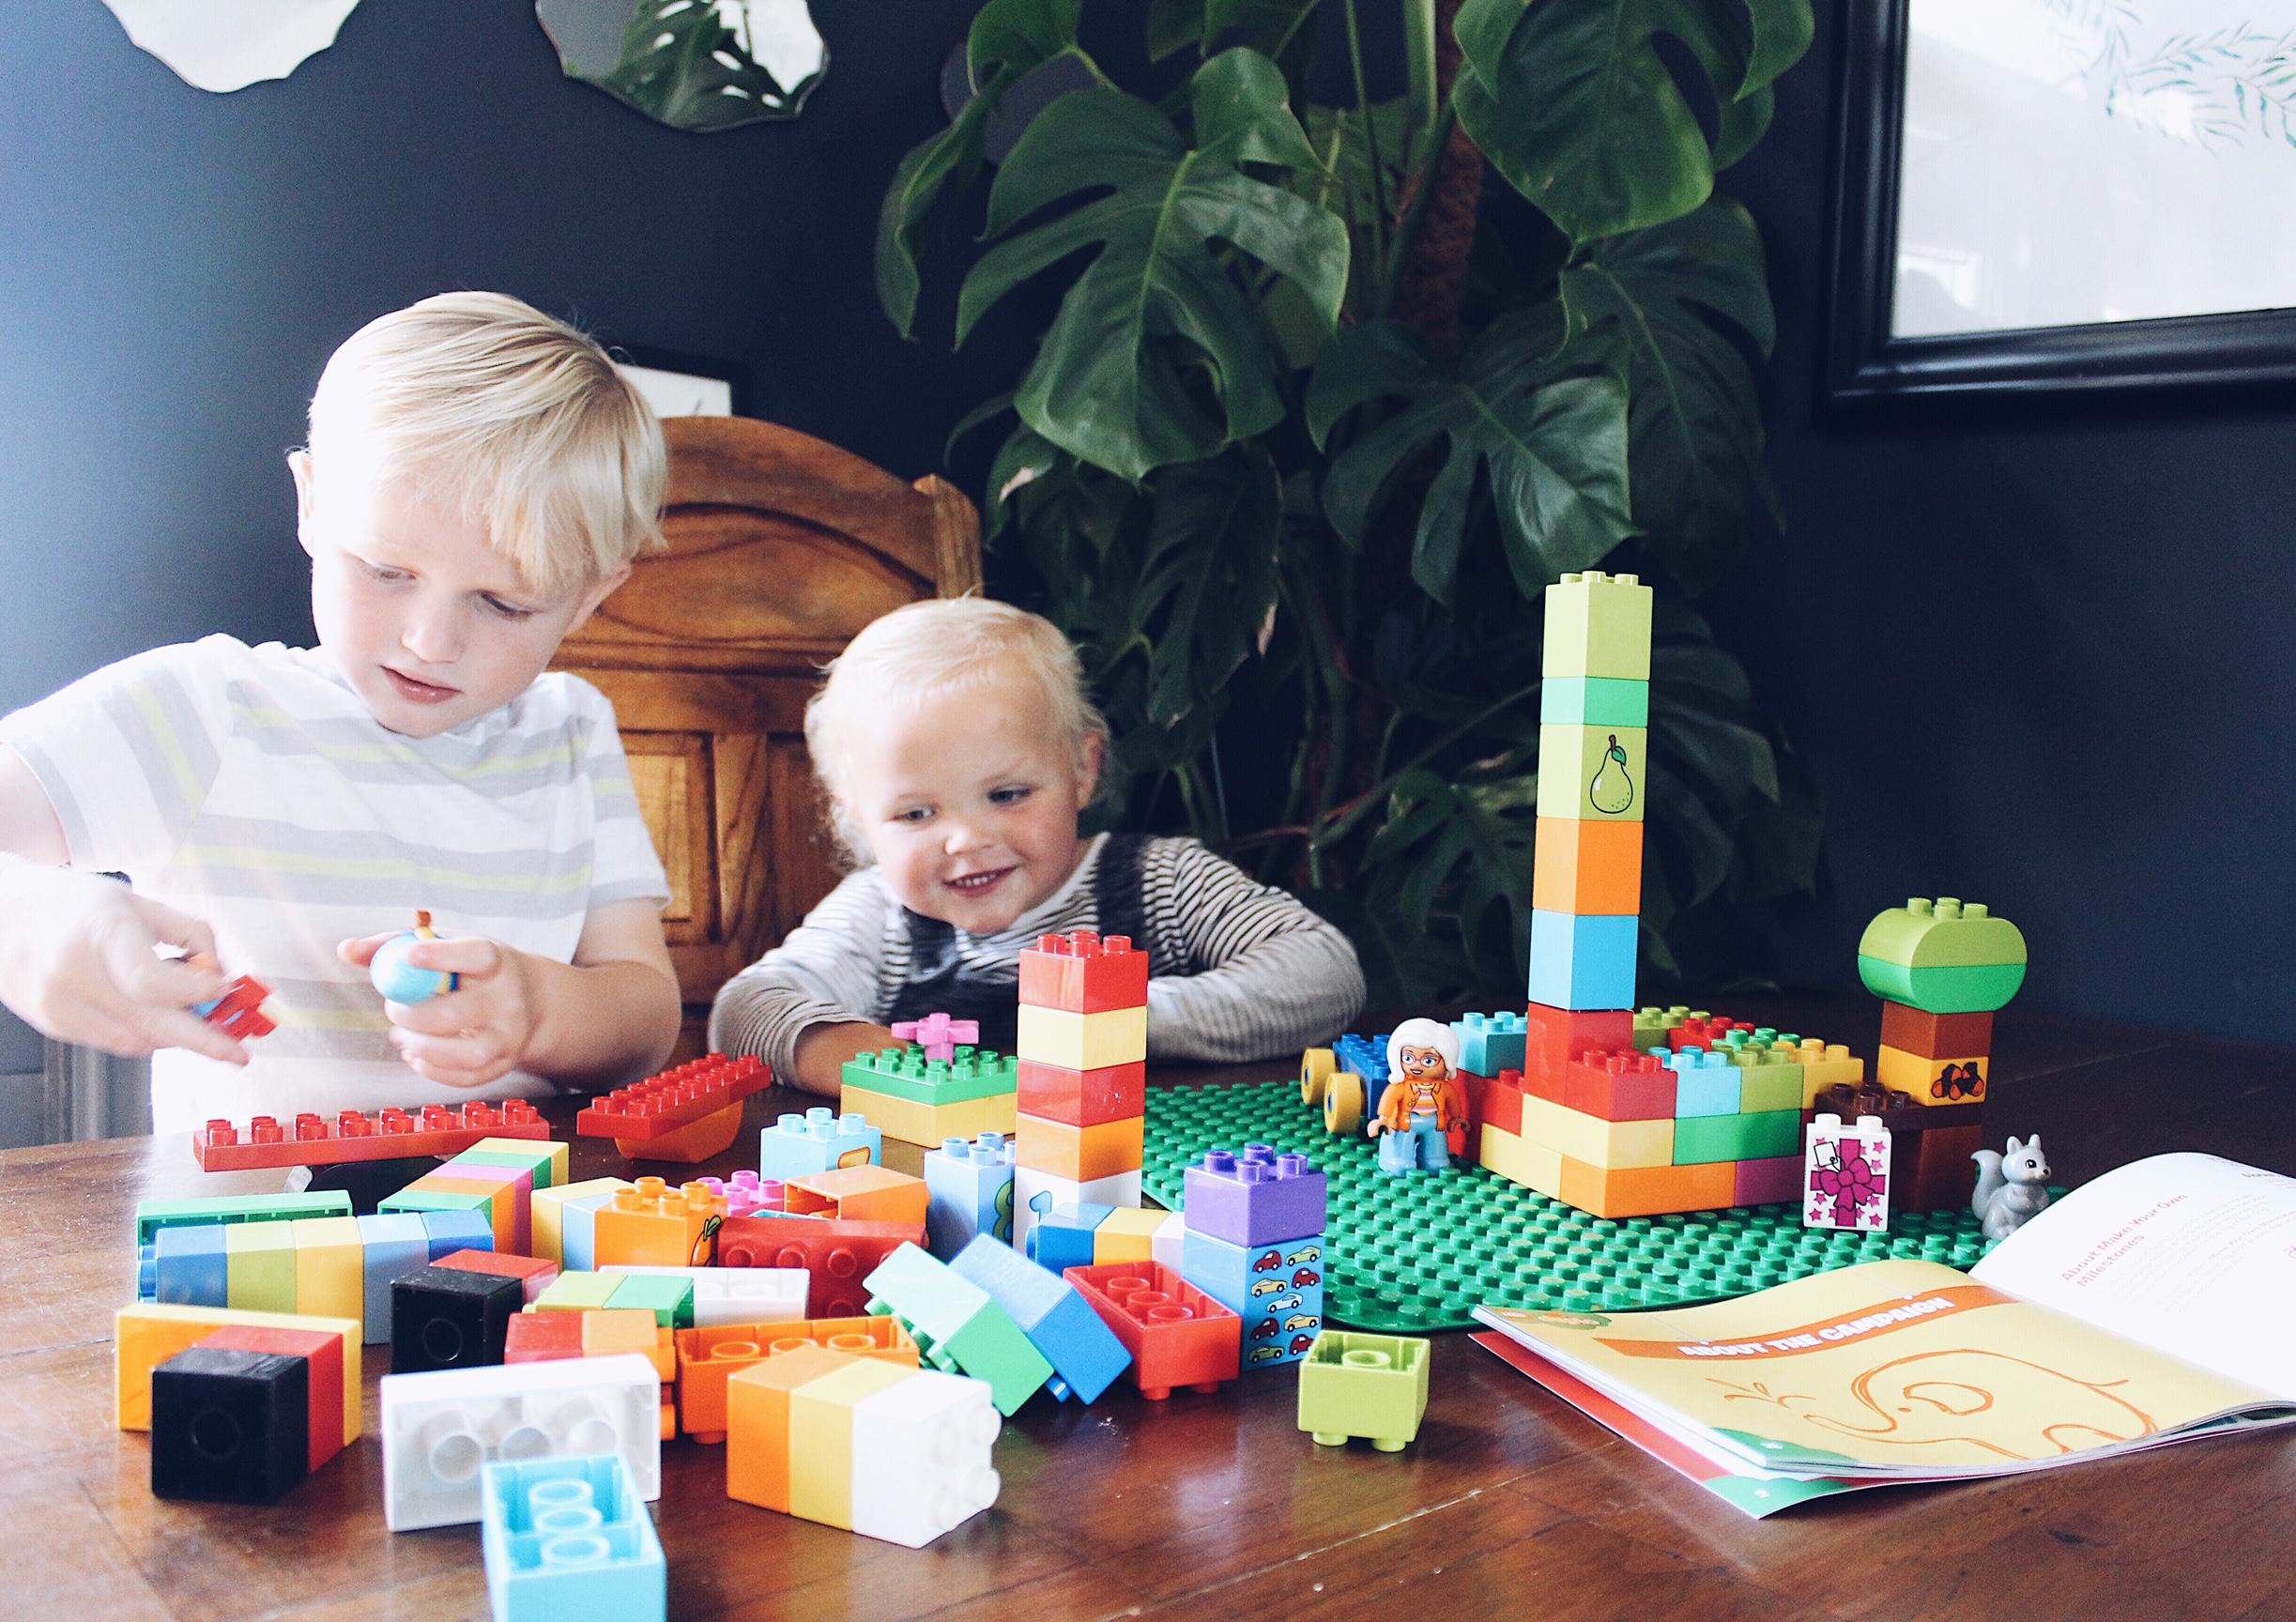 Lego DUPLO campaign